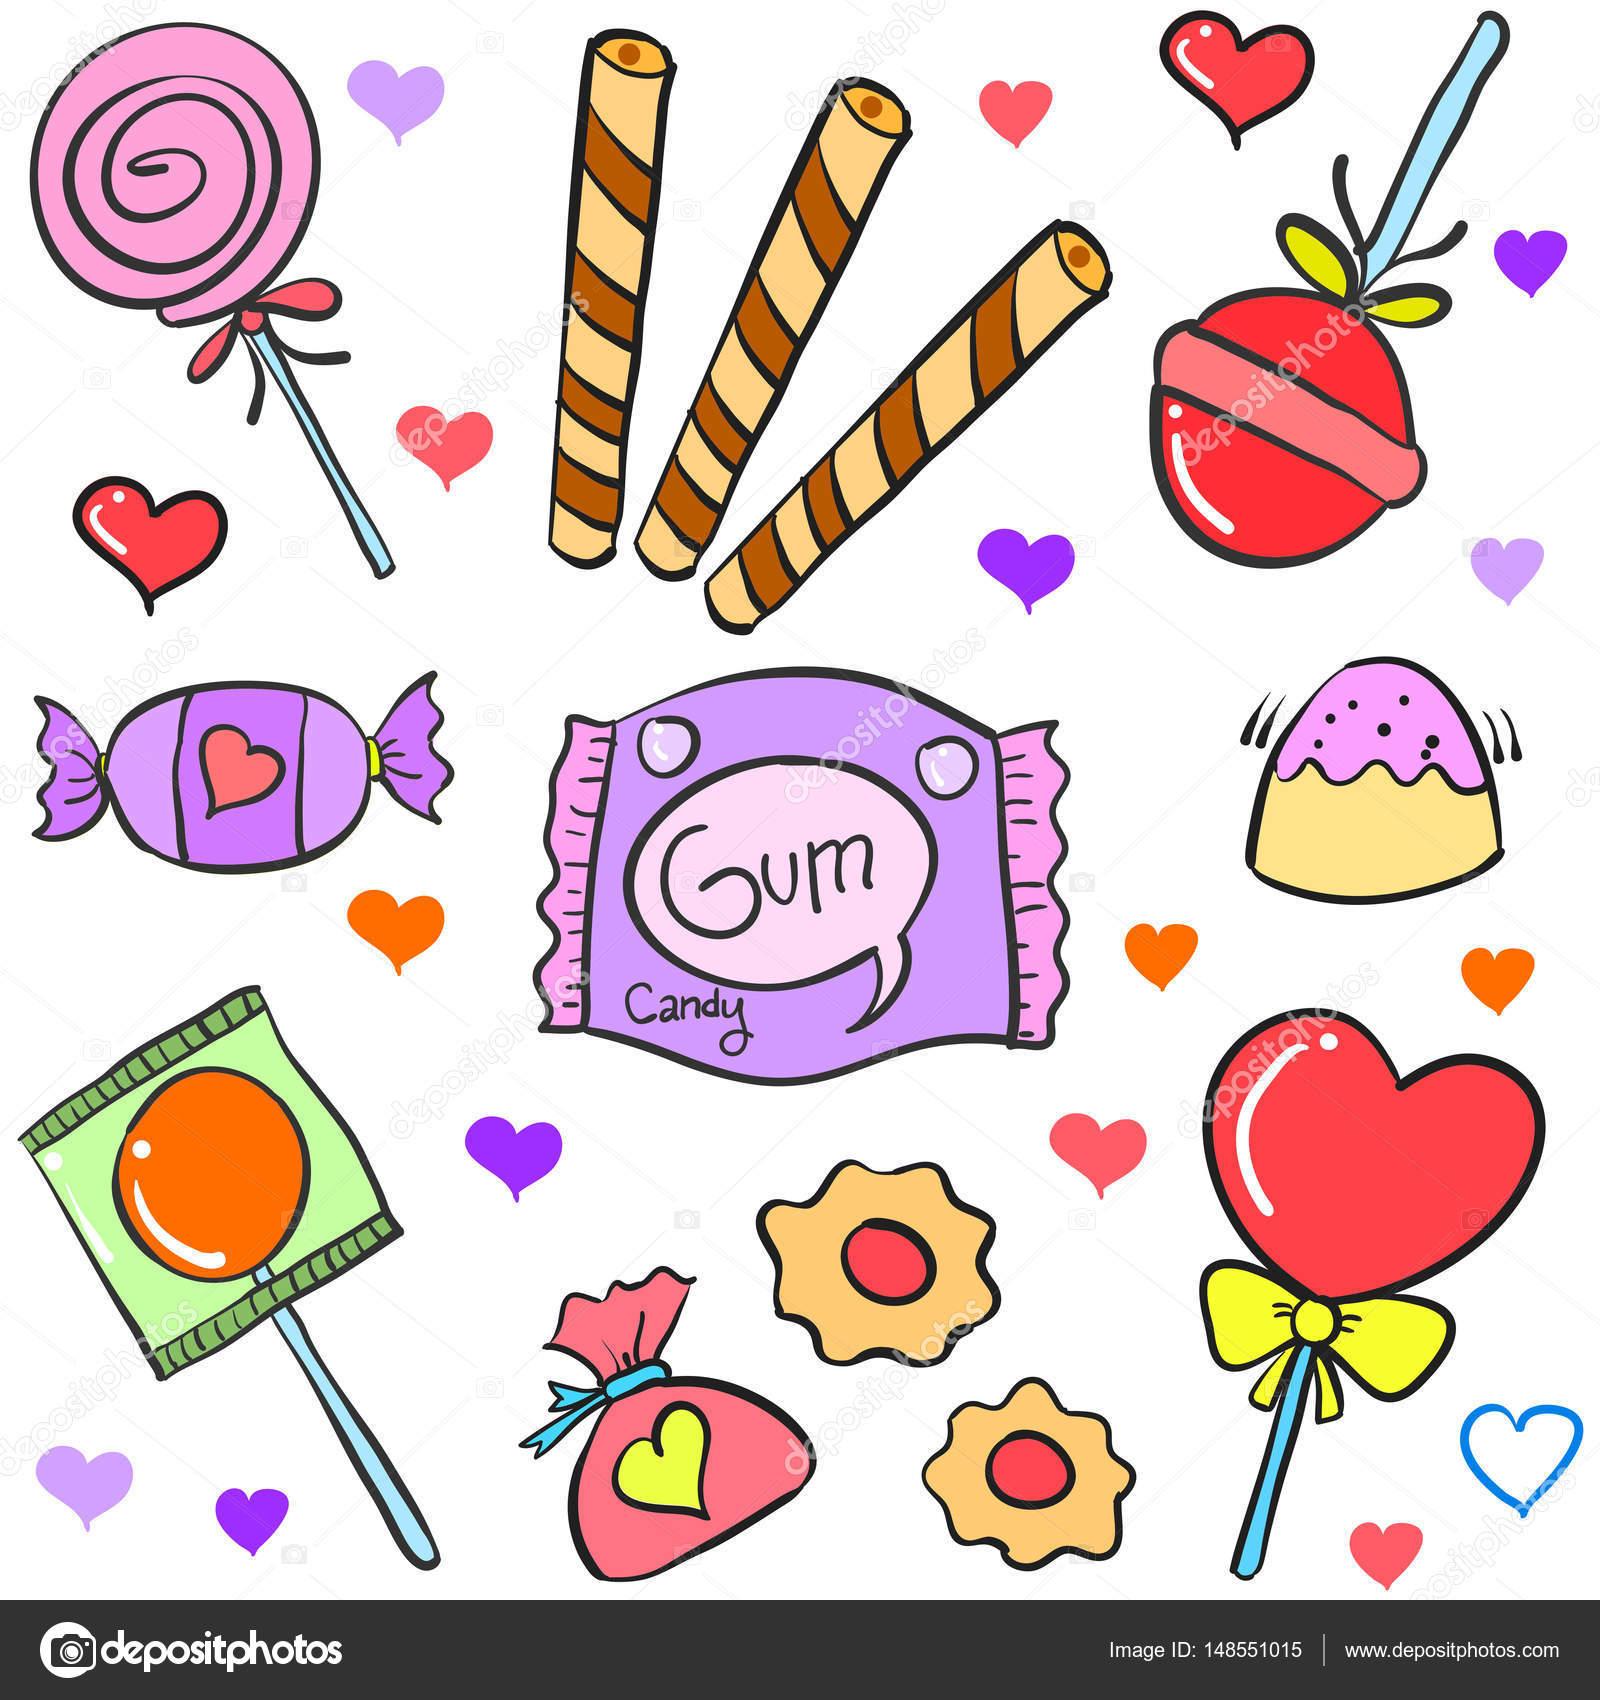 Divers bonbons part dessiner style doodle image - Bonbon a dessiner ...